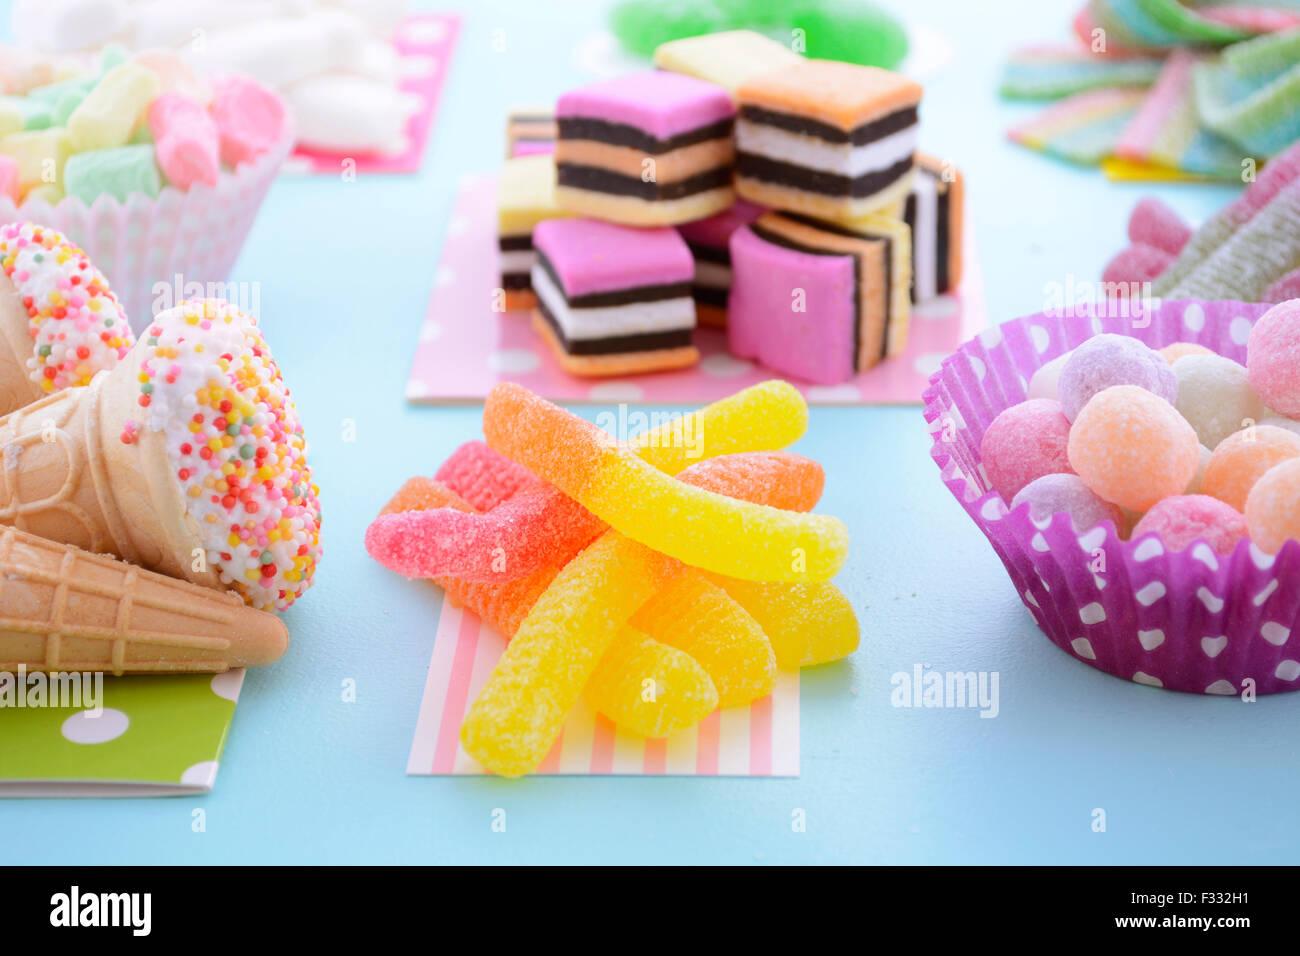 Halloween Candy Bag Stockfotos & Halloween Candy Bag Bilder - Seite ...